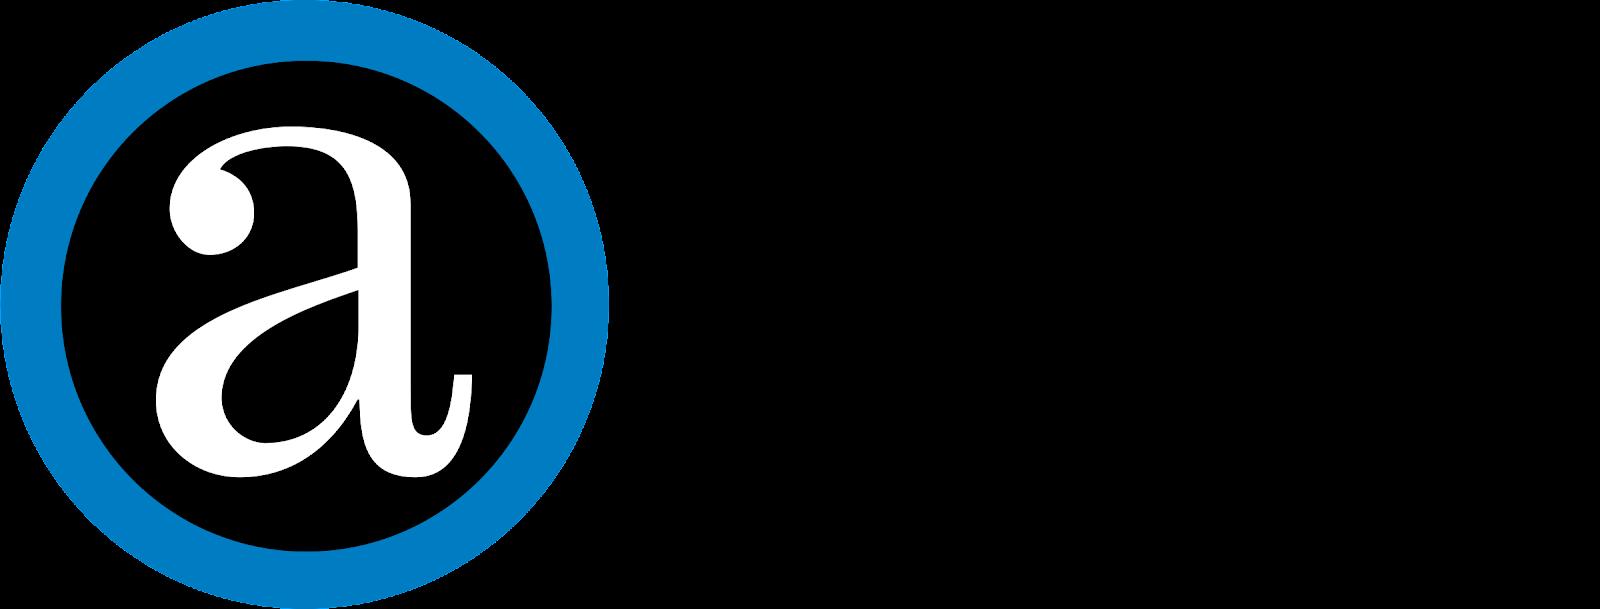 Alexa Logo PNG Transparent & SVG Vector - Freebie Supply